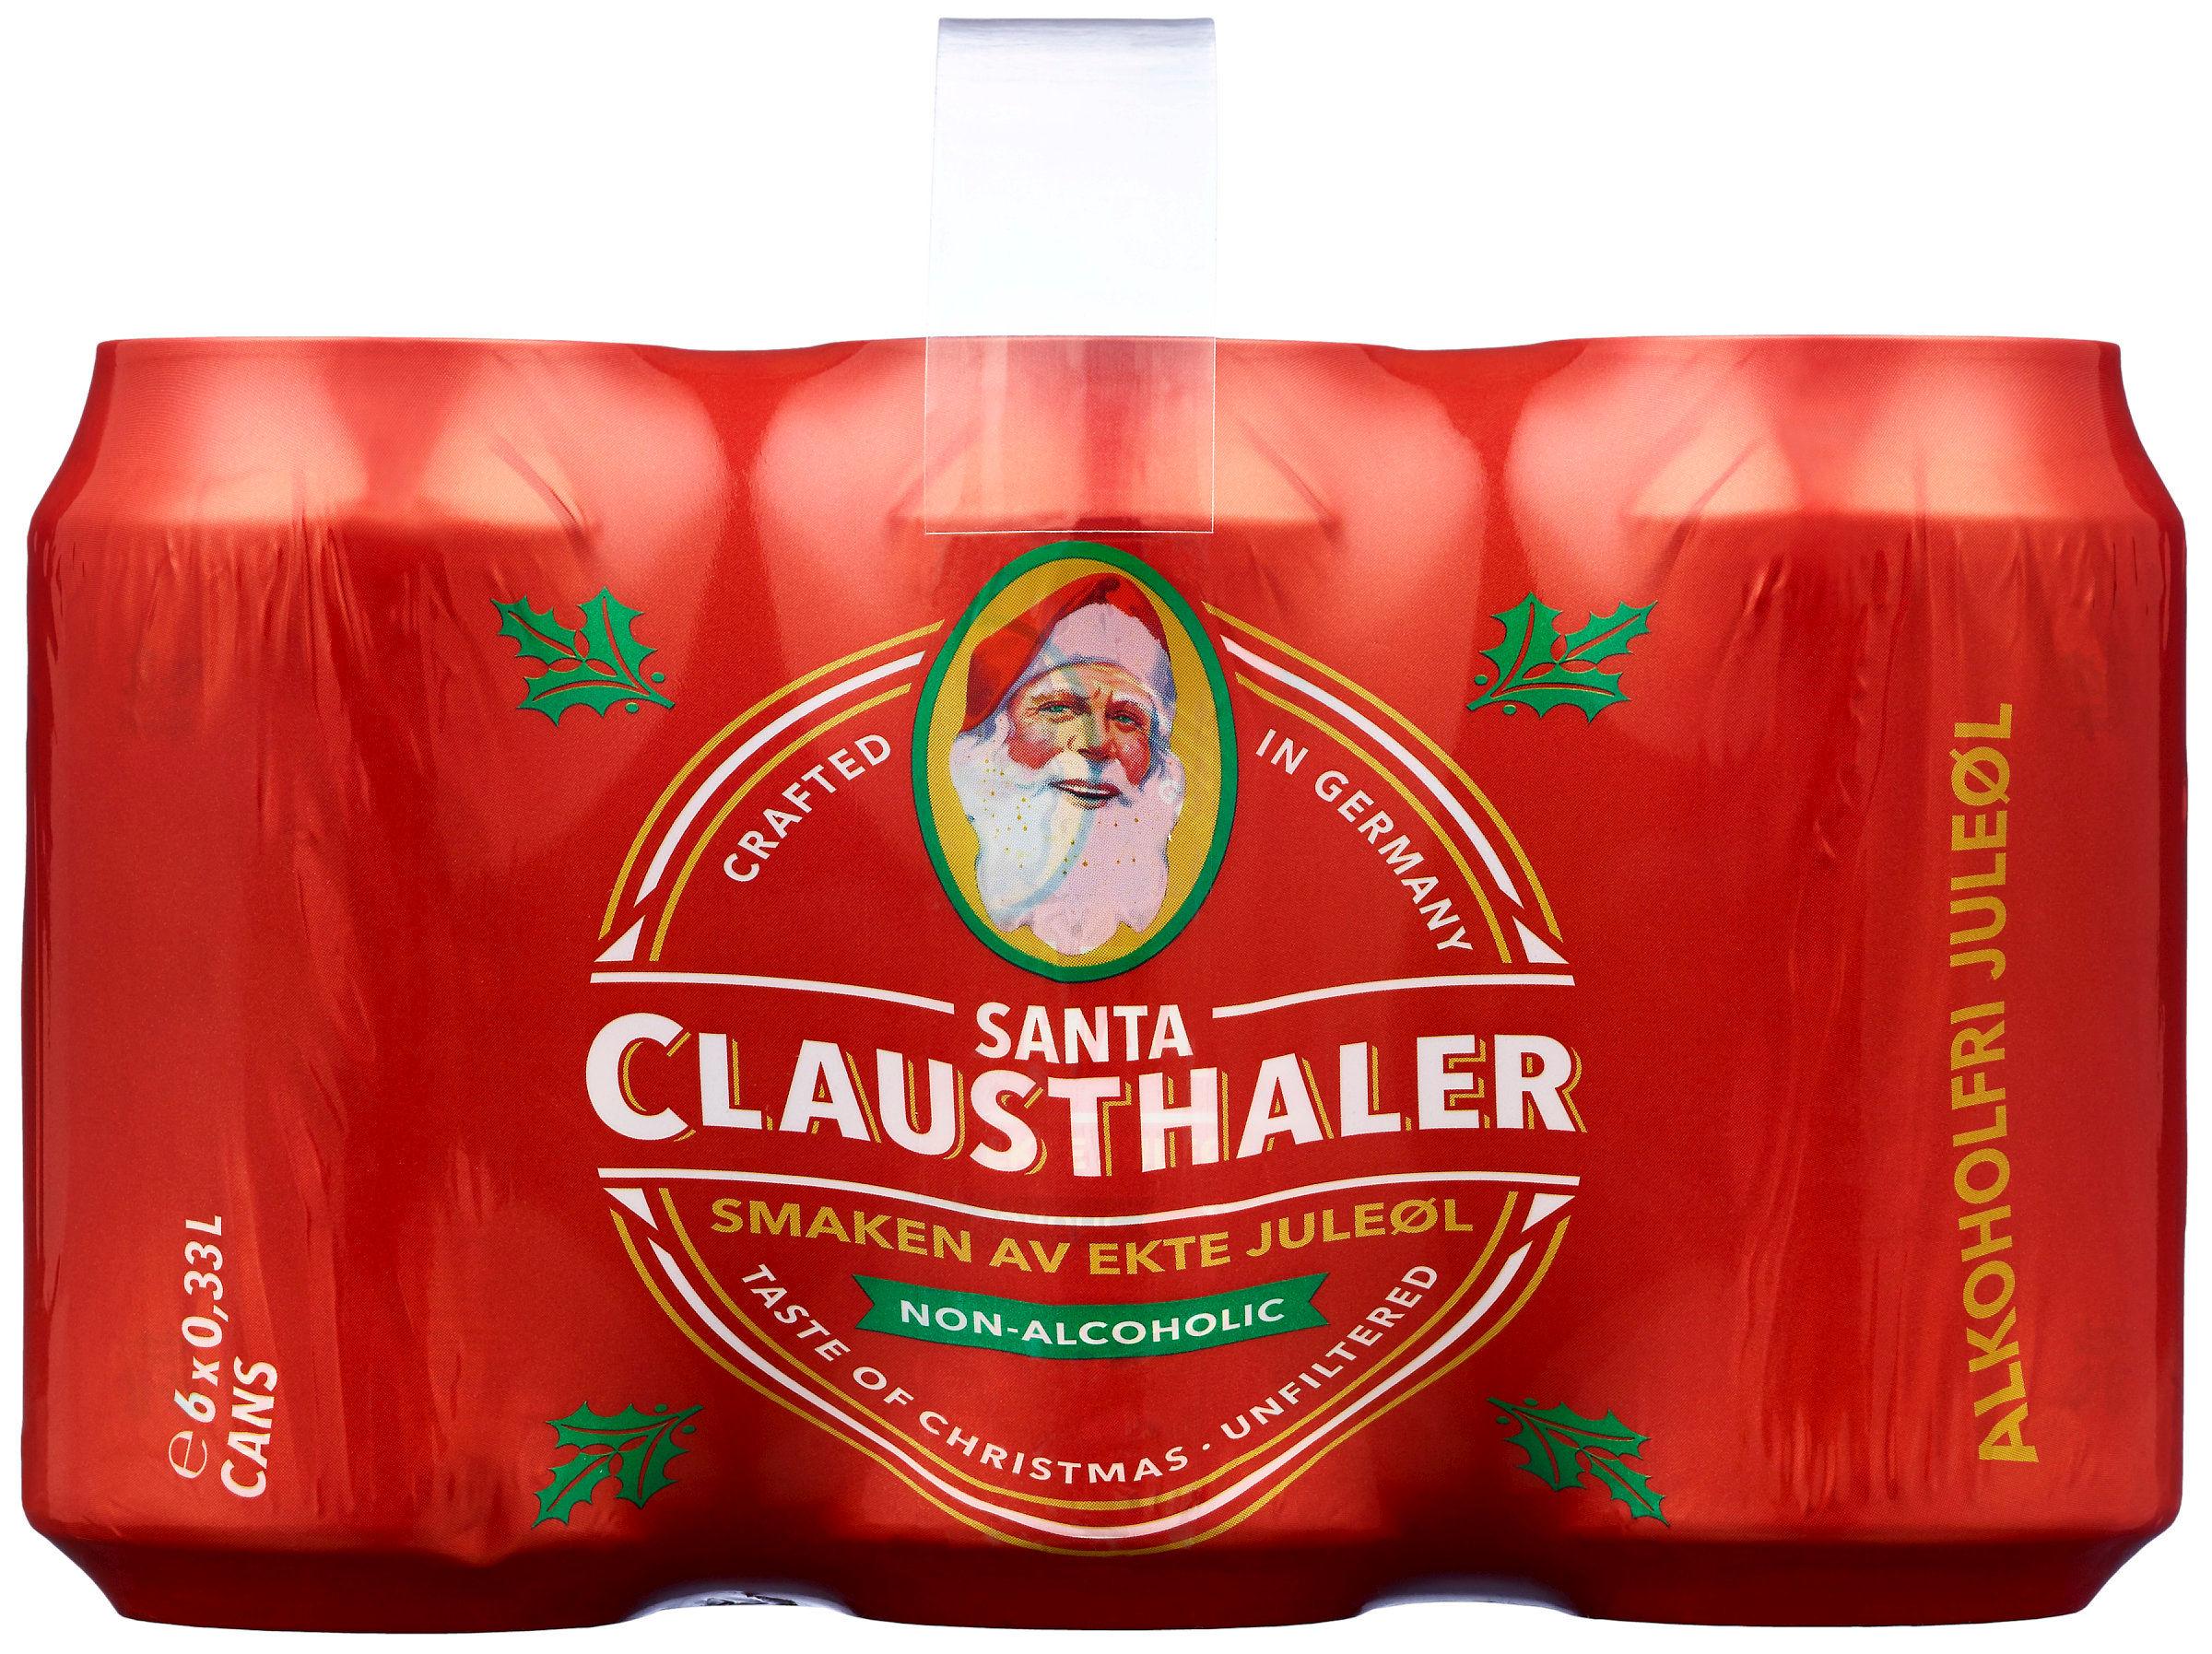 Santa juleøl fra Clausthaler har fått ny design julen 2018